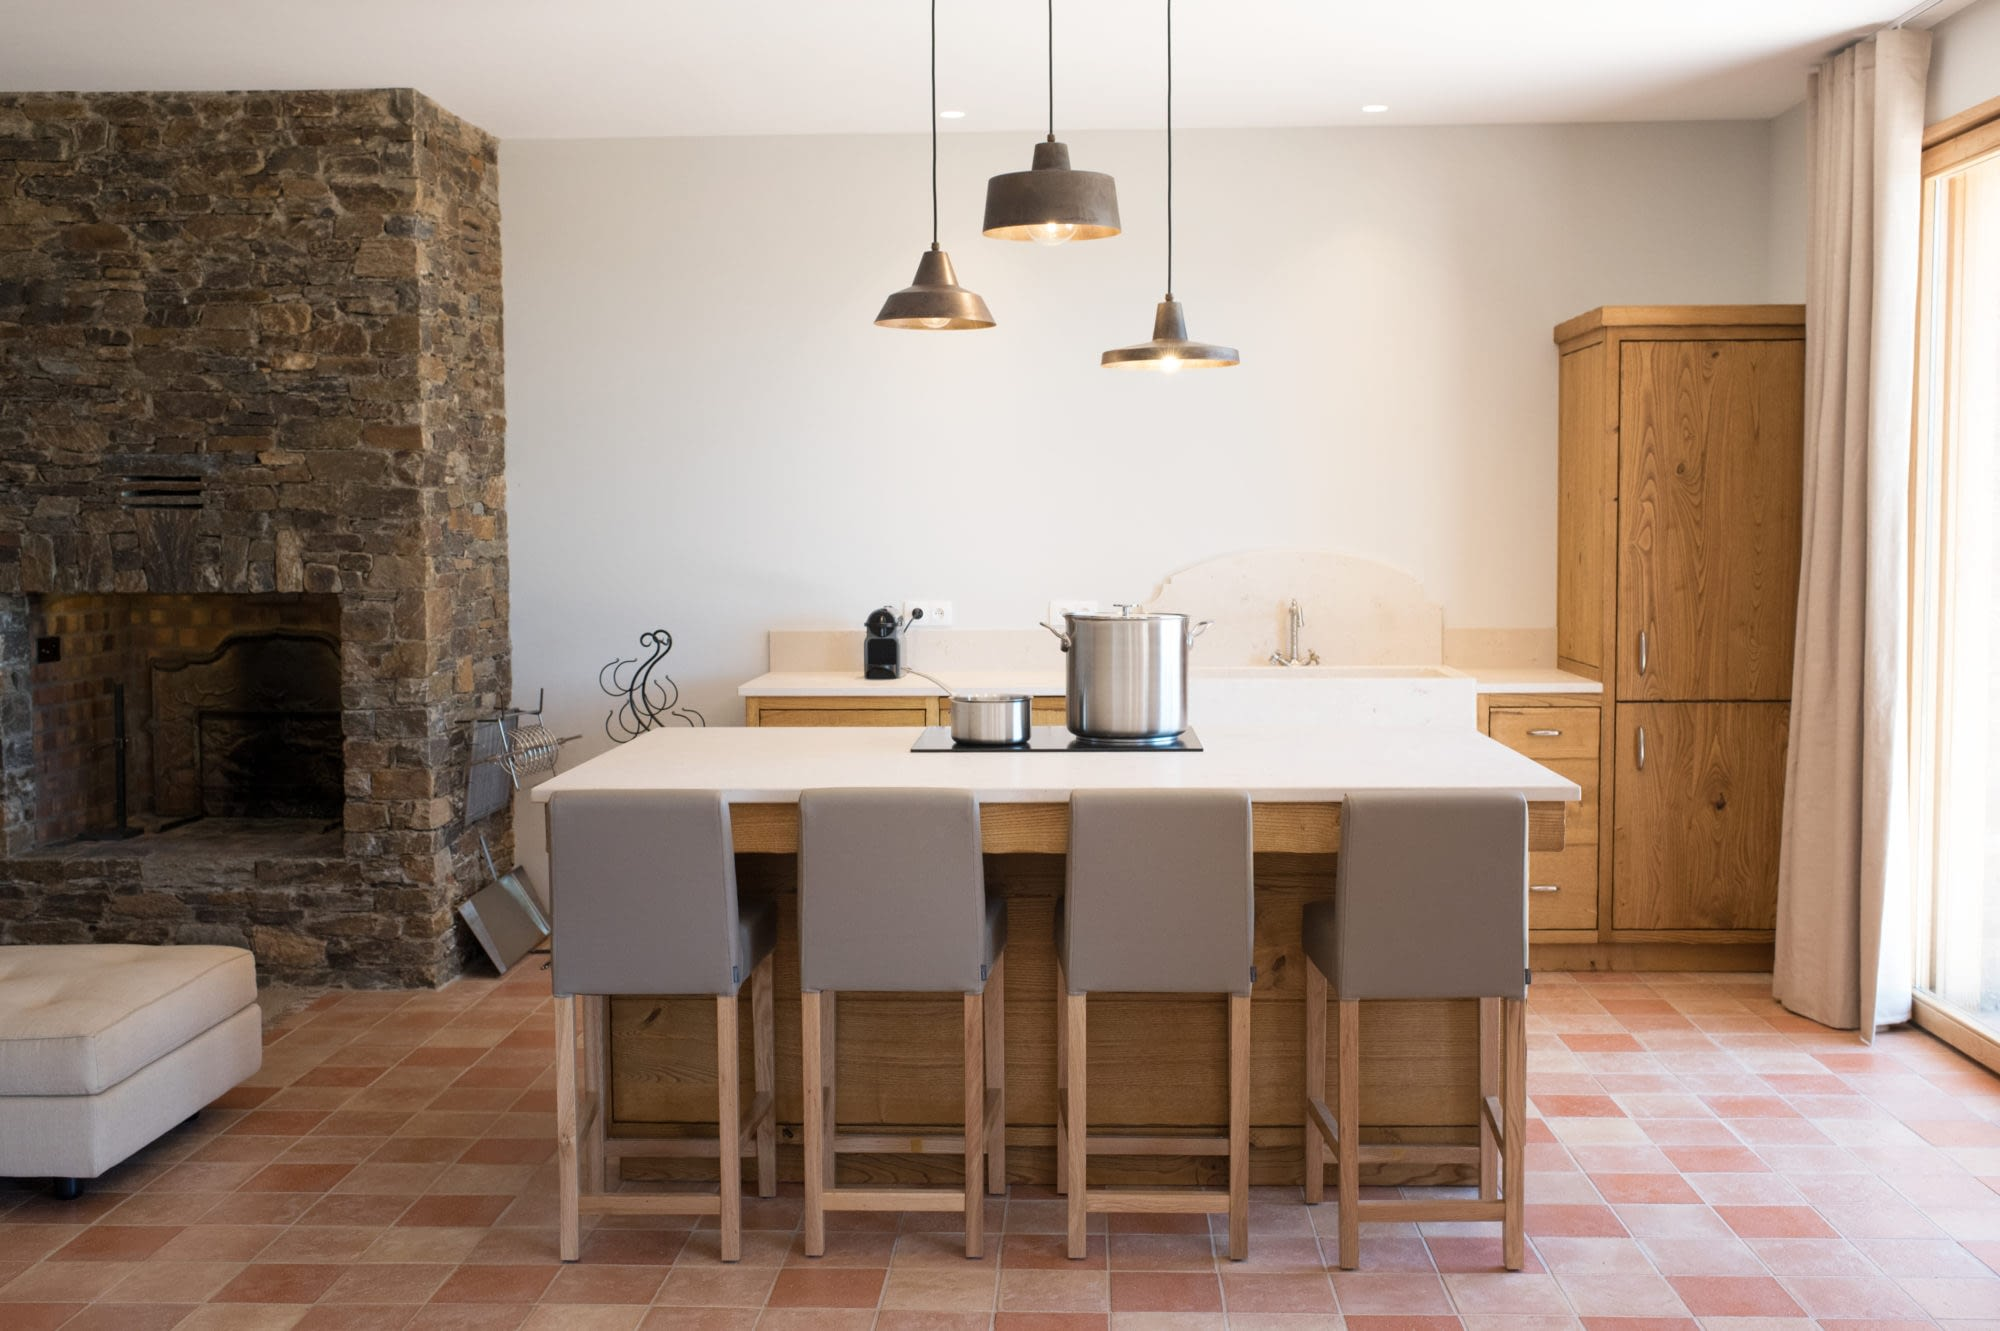 Cuisine et cheminée dans Le grand chêne / Kitchen and chimney in the house Le grand chêne